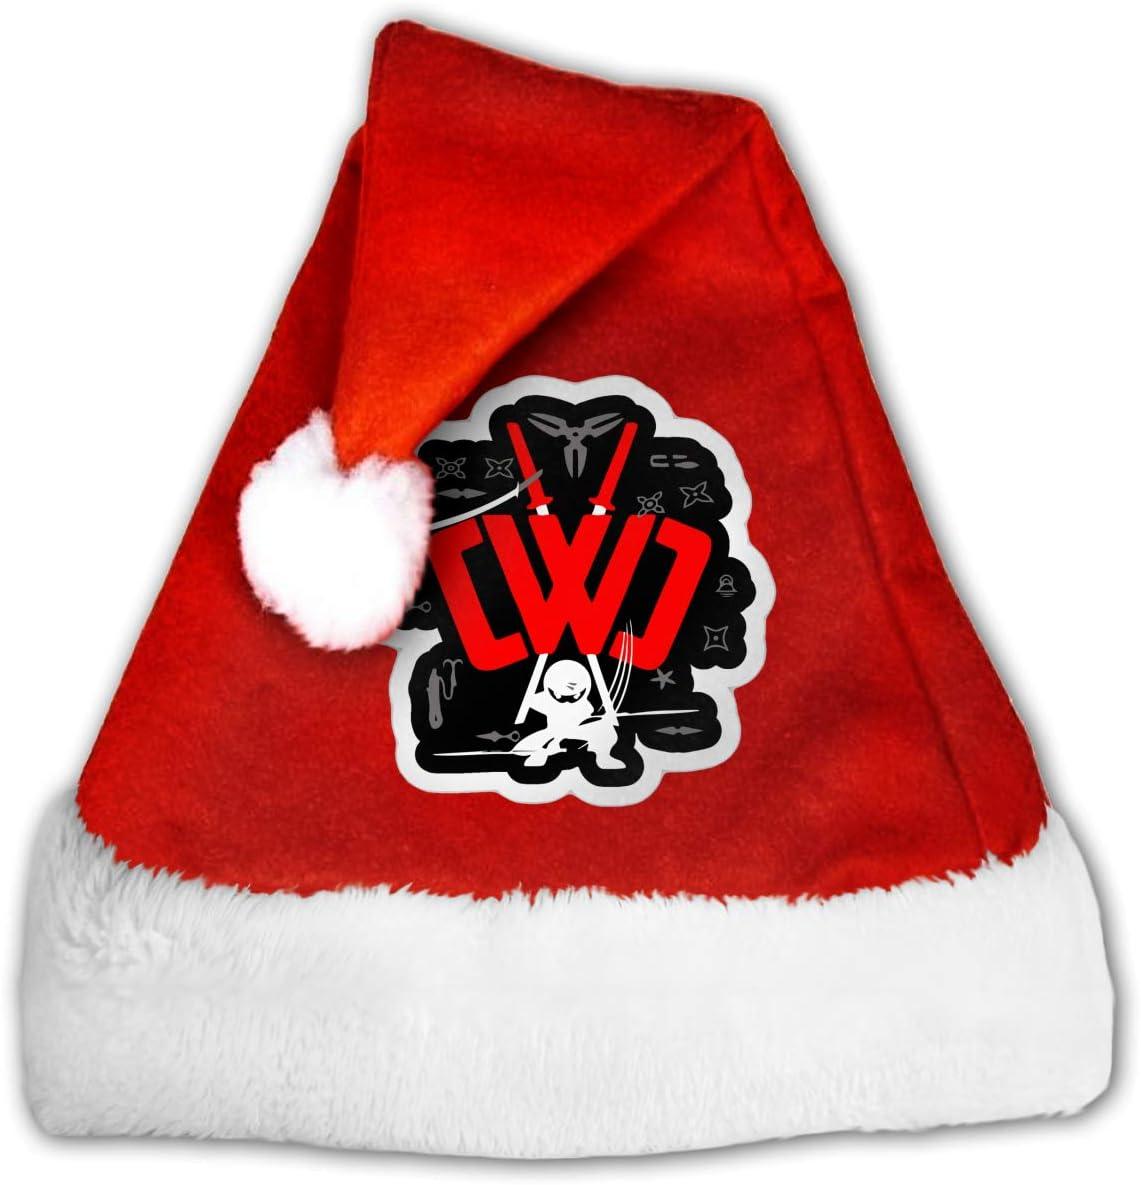 Amazon.com: CWC Chad Wild Clay Ninja (4) Christmas Santa Hat ...